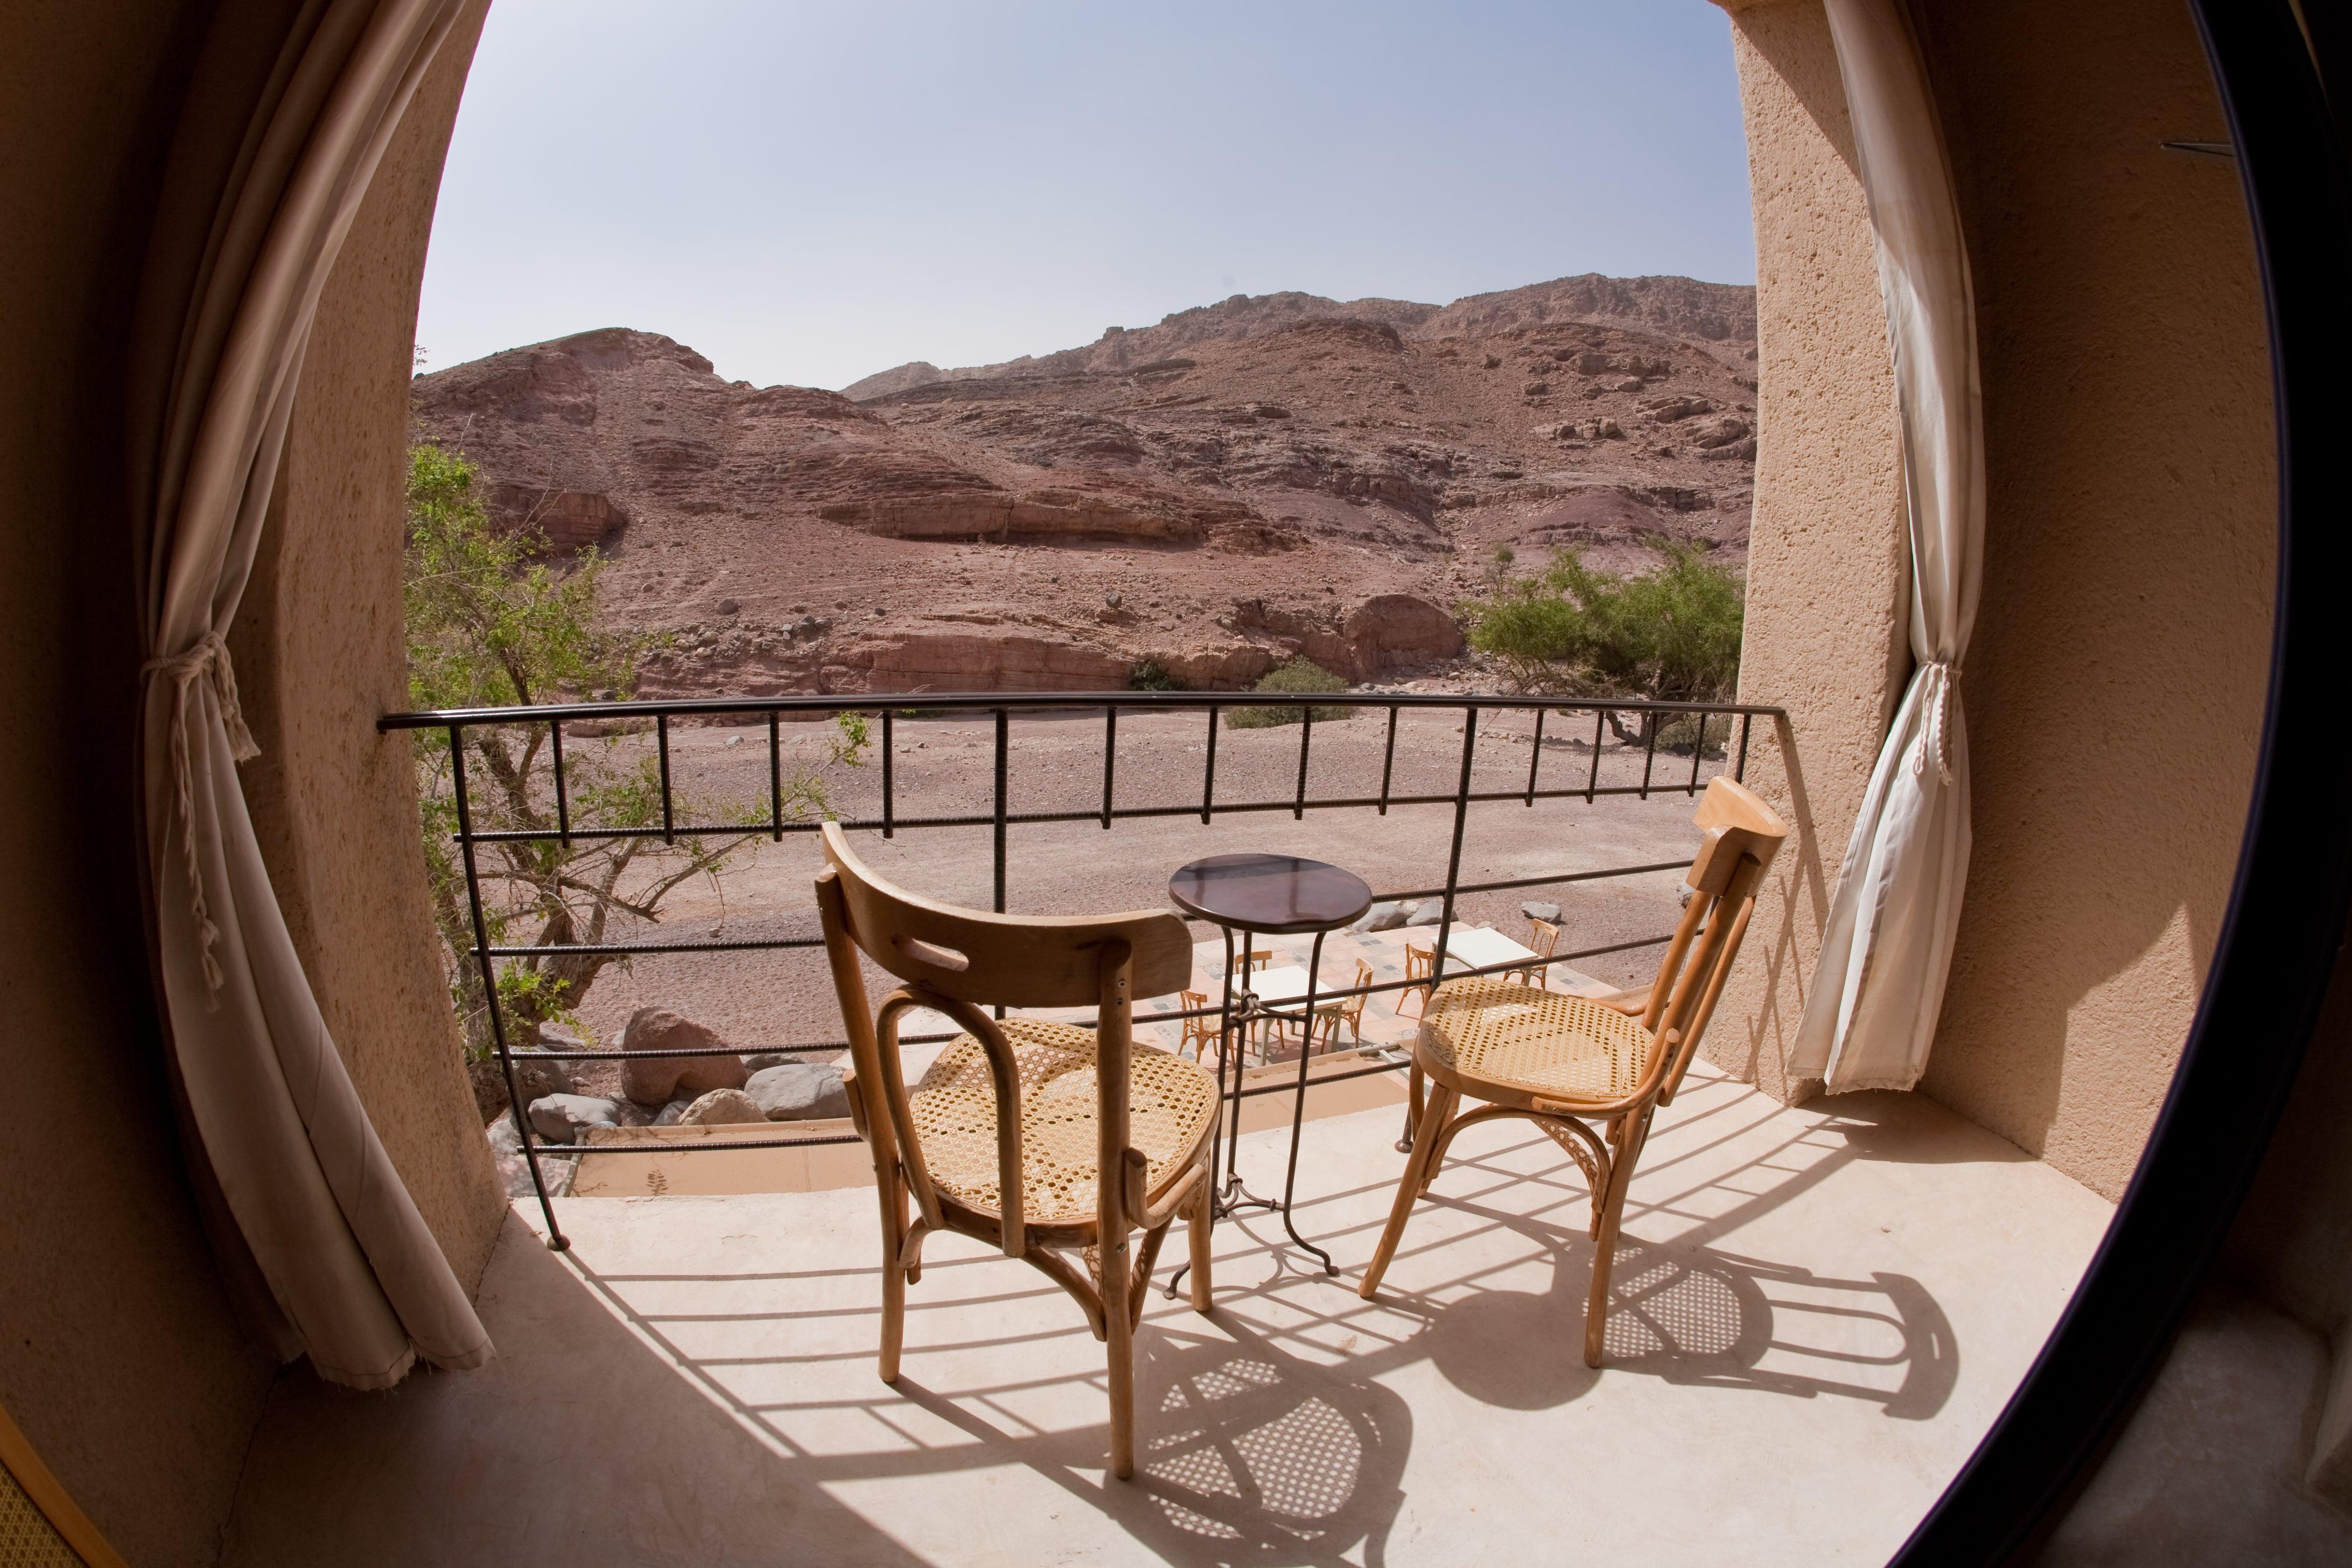 Unitrips-jordanie-feynan-lodge-© Feynan Ecolodge-Photo by Brian Scannell-min